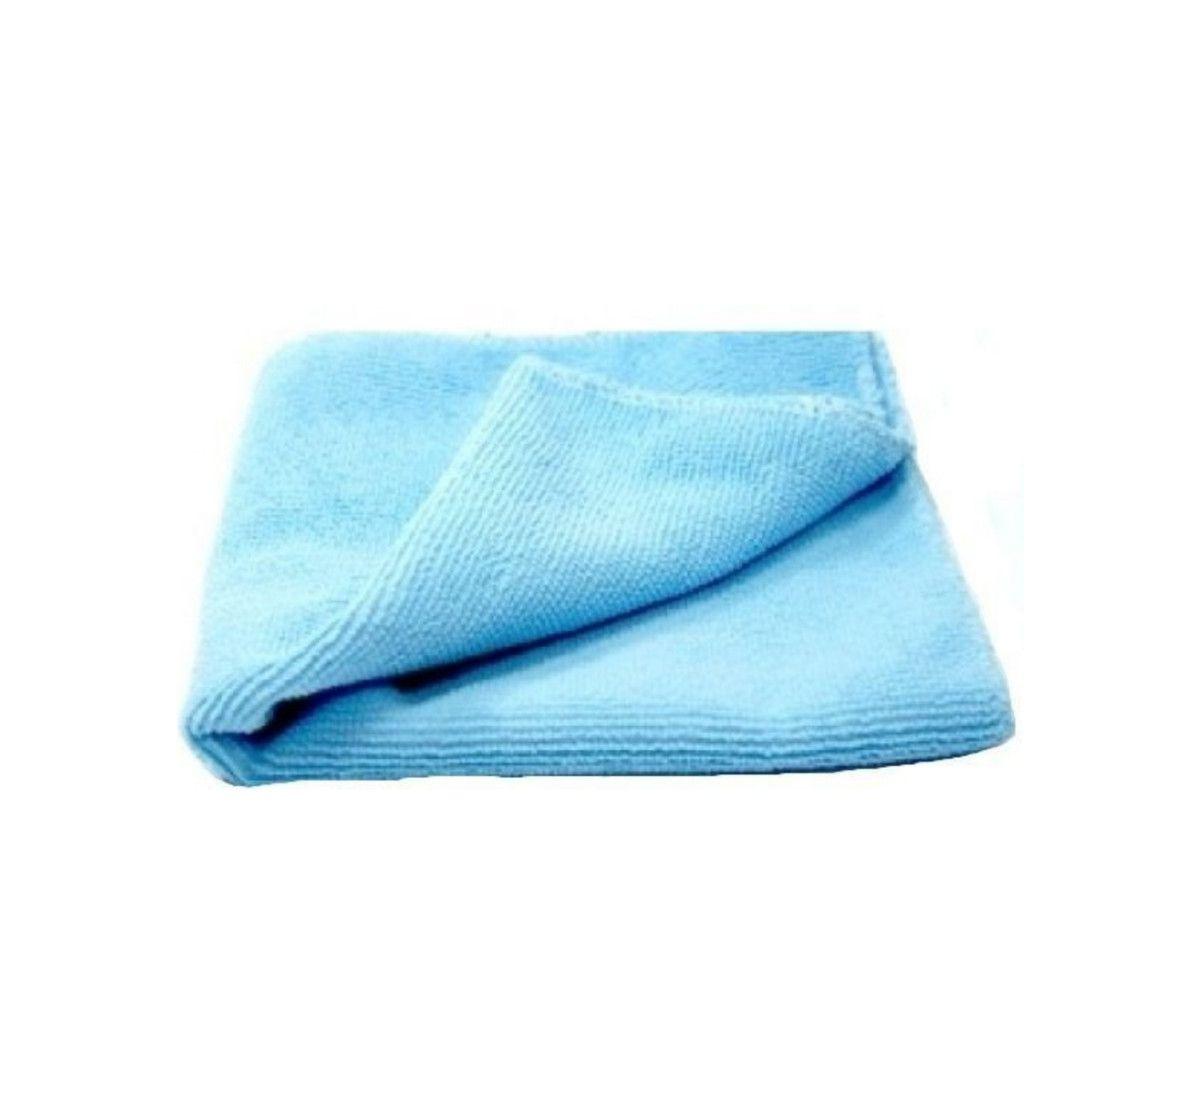 Limpador A Seco Prot-Dry Protelim 5L + 3 Flanelas De Microfibra 38x38